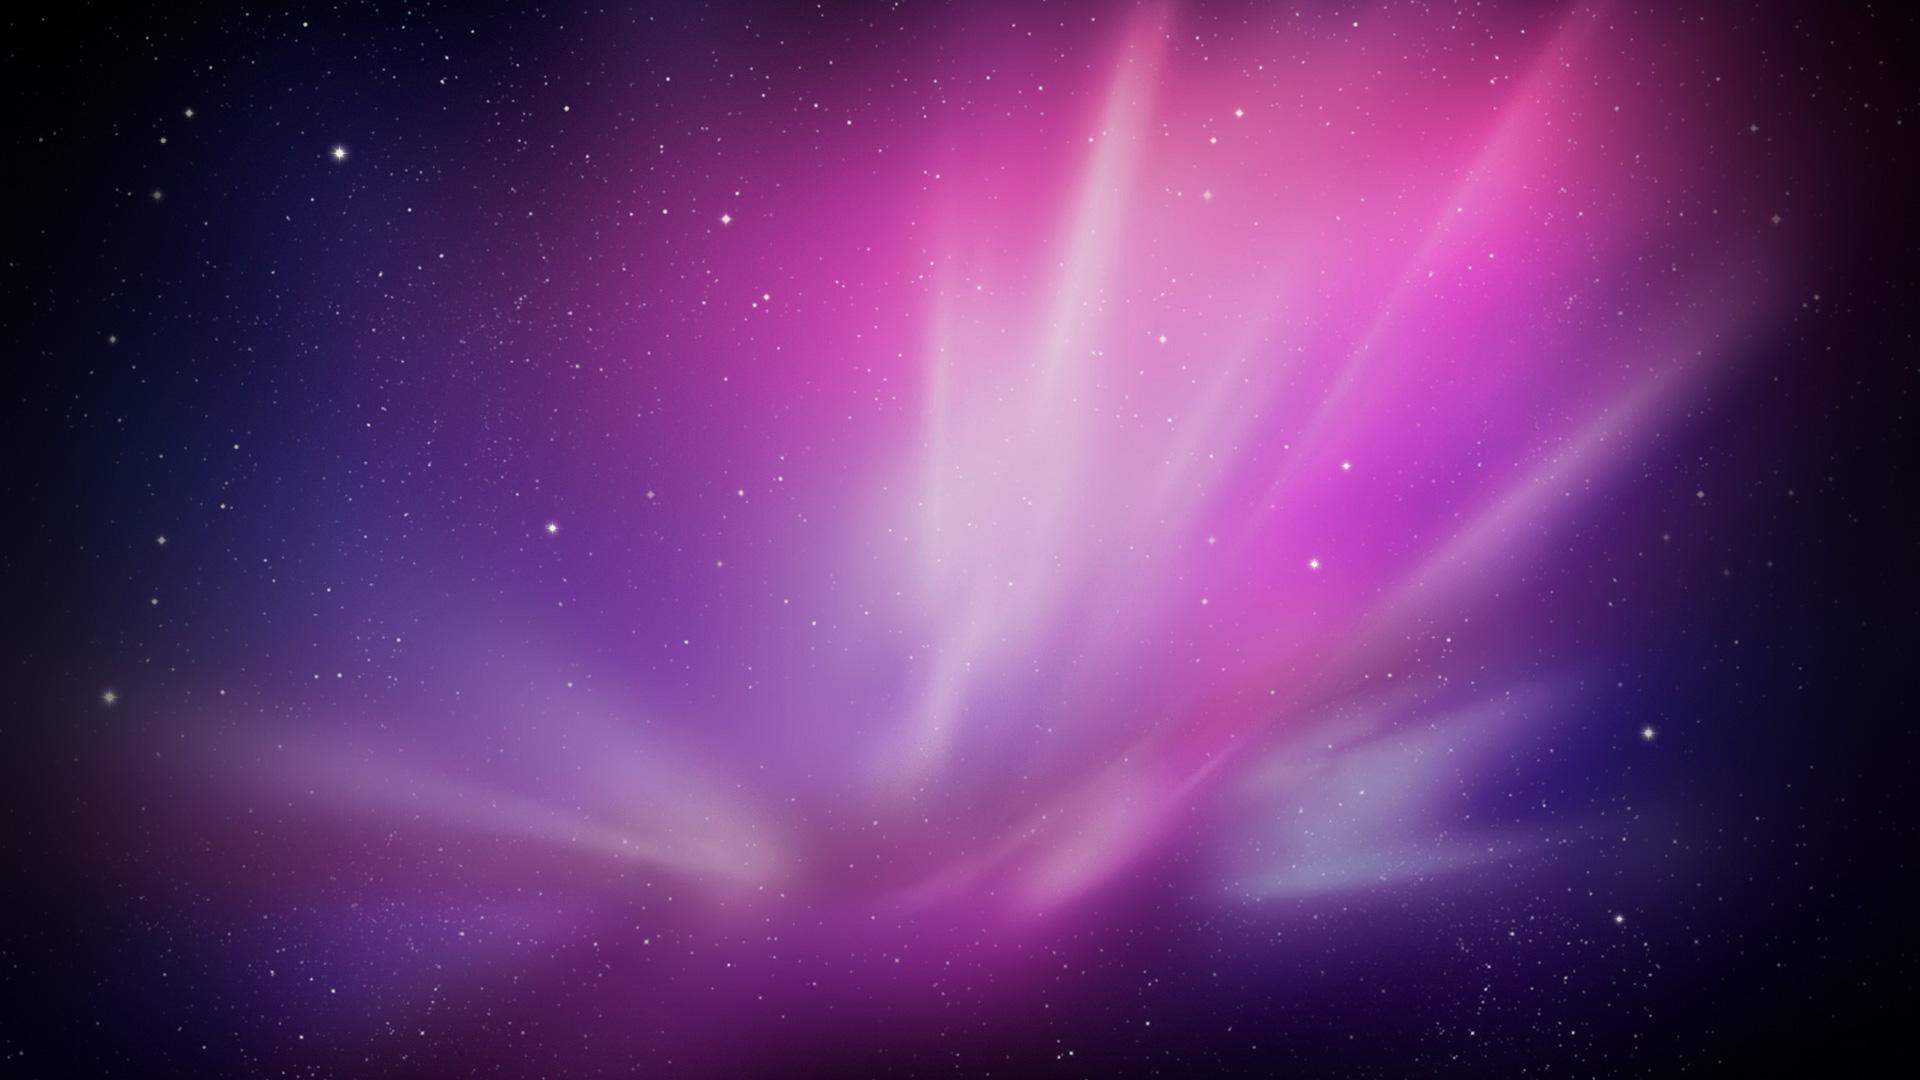 Tech Full HD Wallpapers download 1080p desktop backgrounds 1920x1080